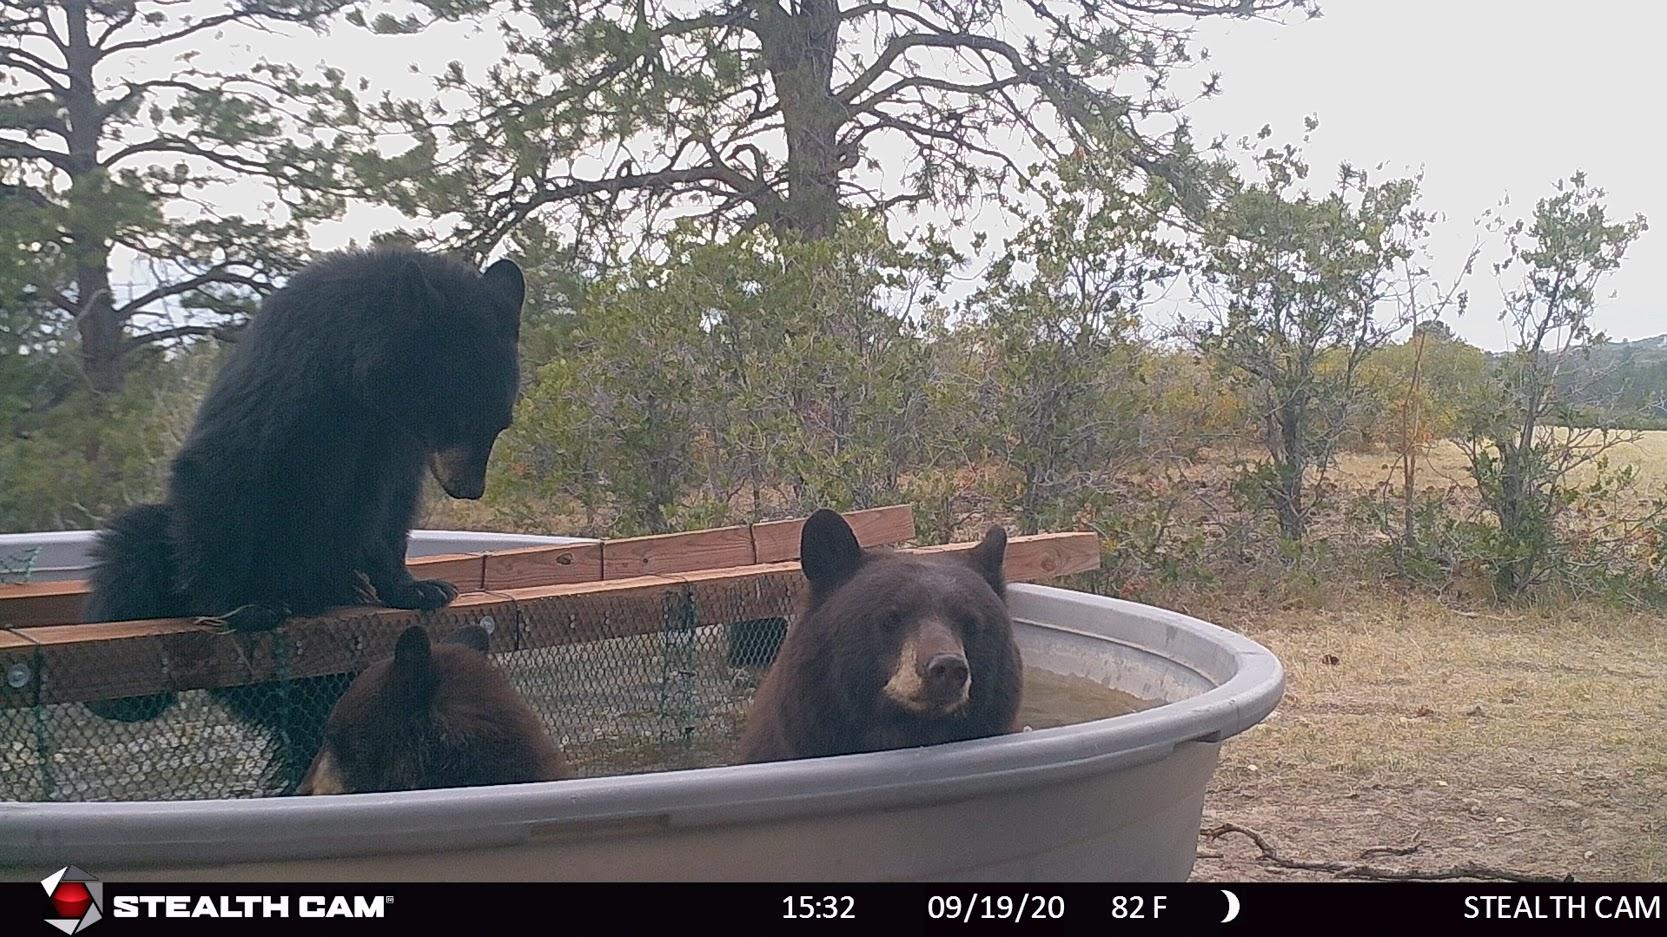 bears playing in water tank